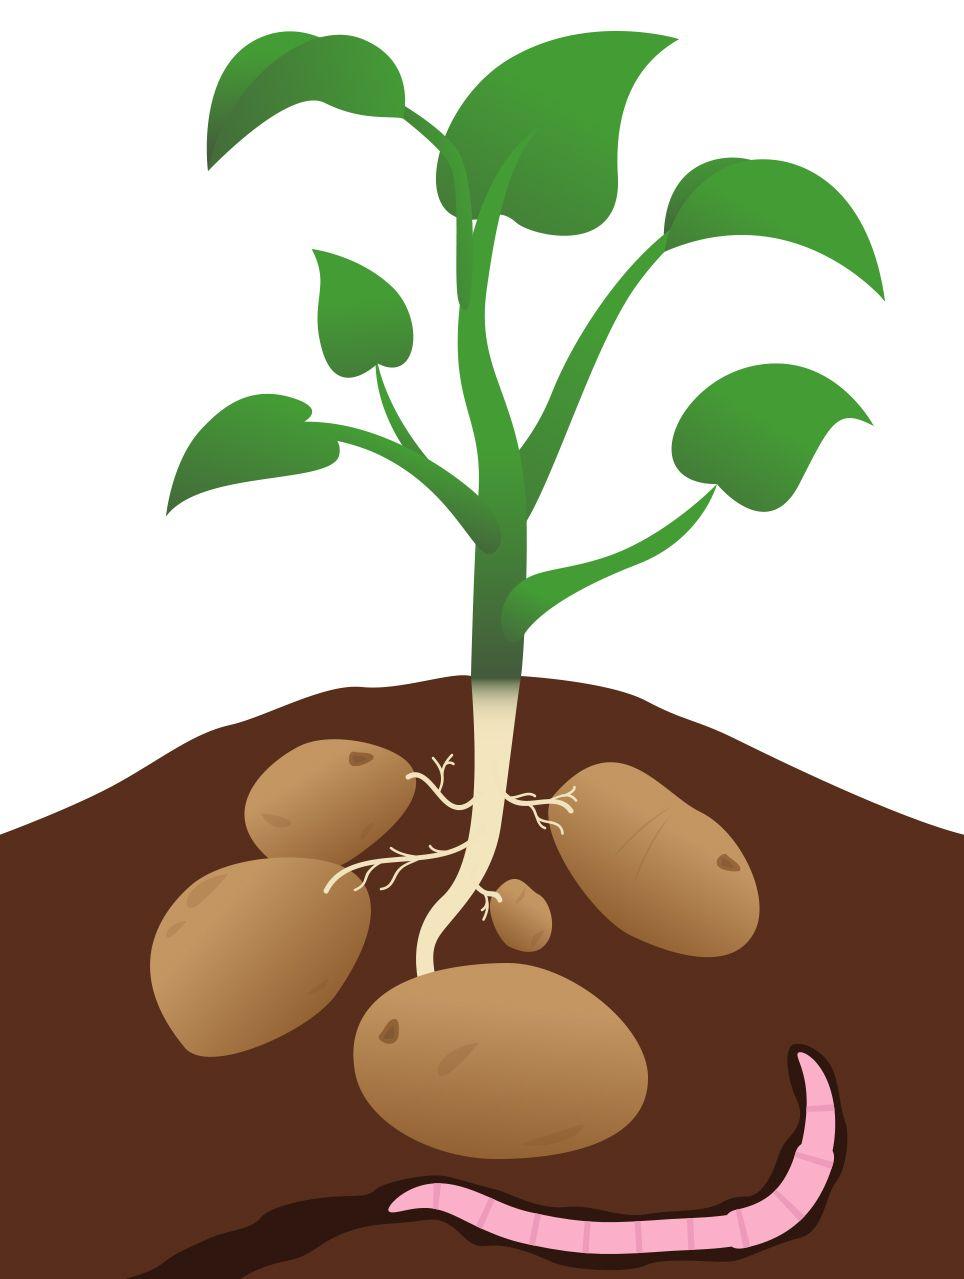 Potato clipart potato plant. Images at t yahoo